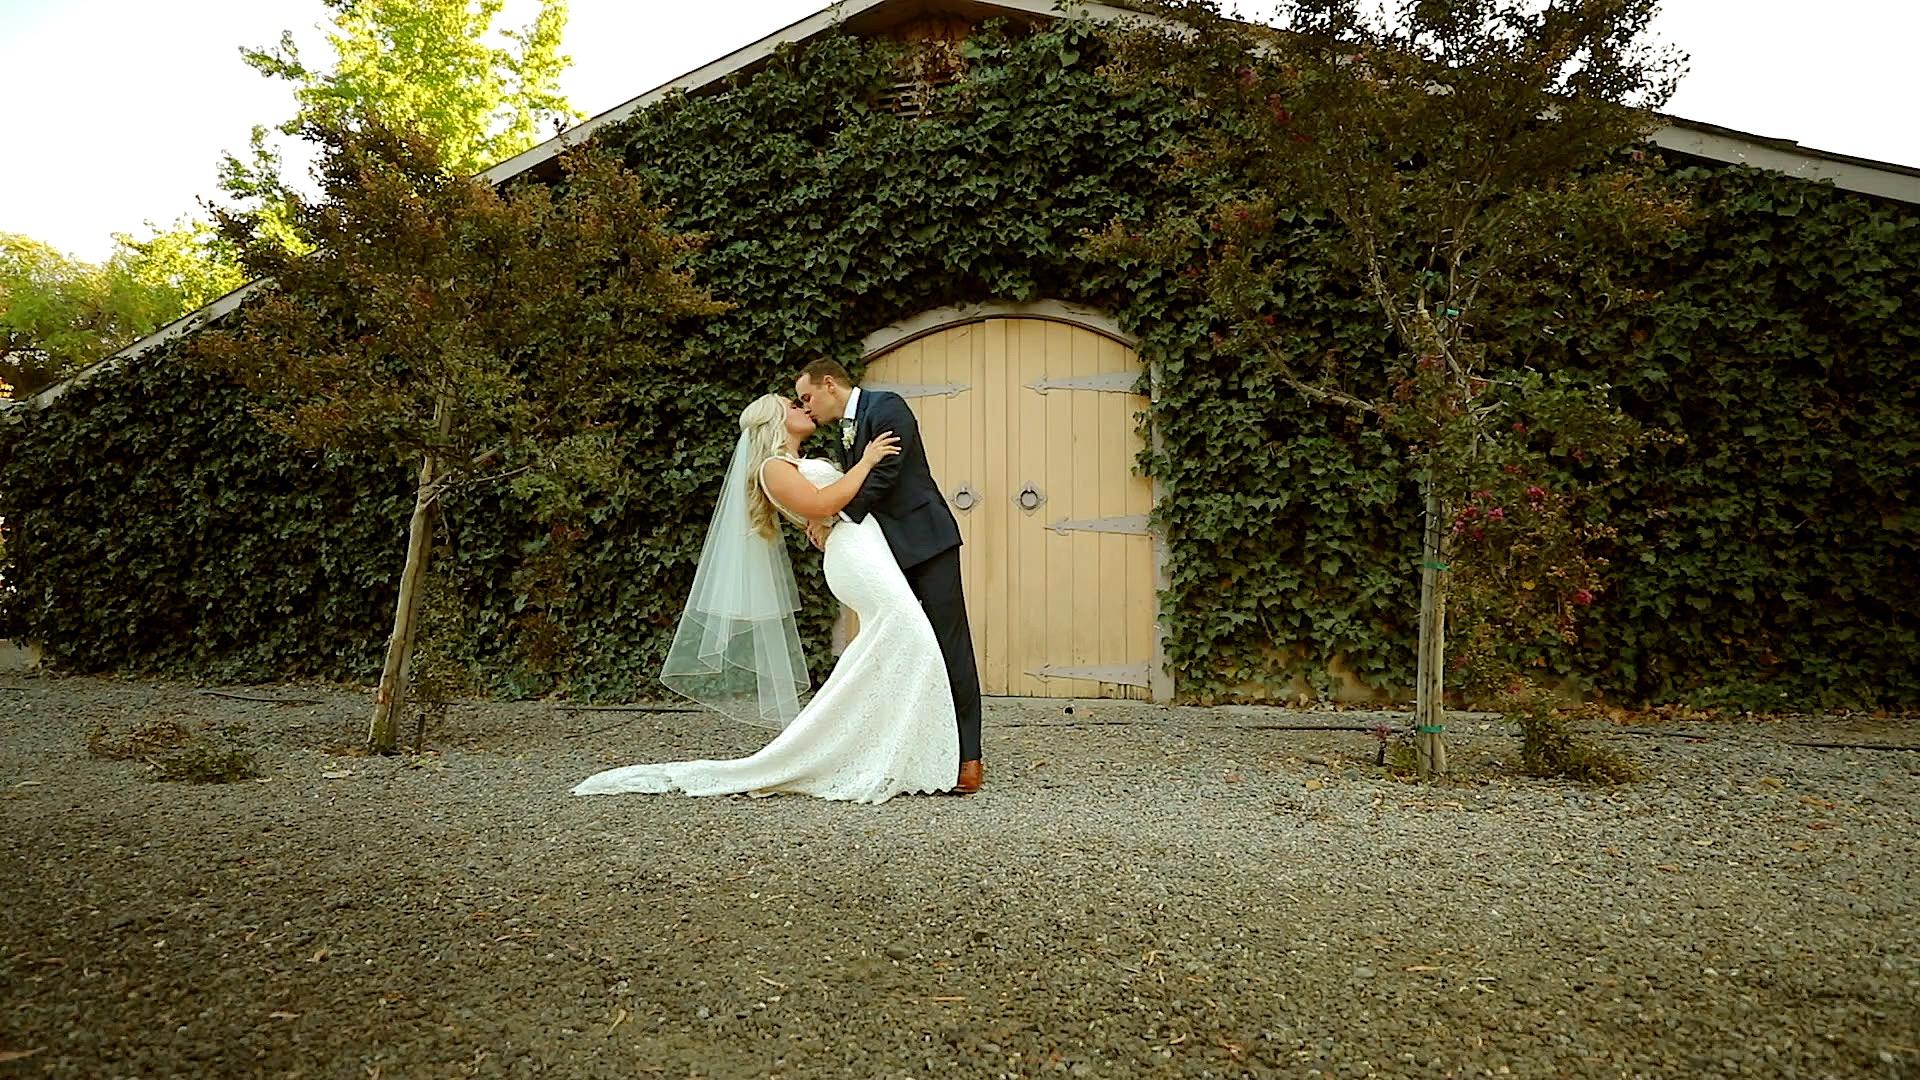 Ryan  + Ashlea  | Geyserville, California | Trentadue